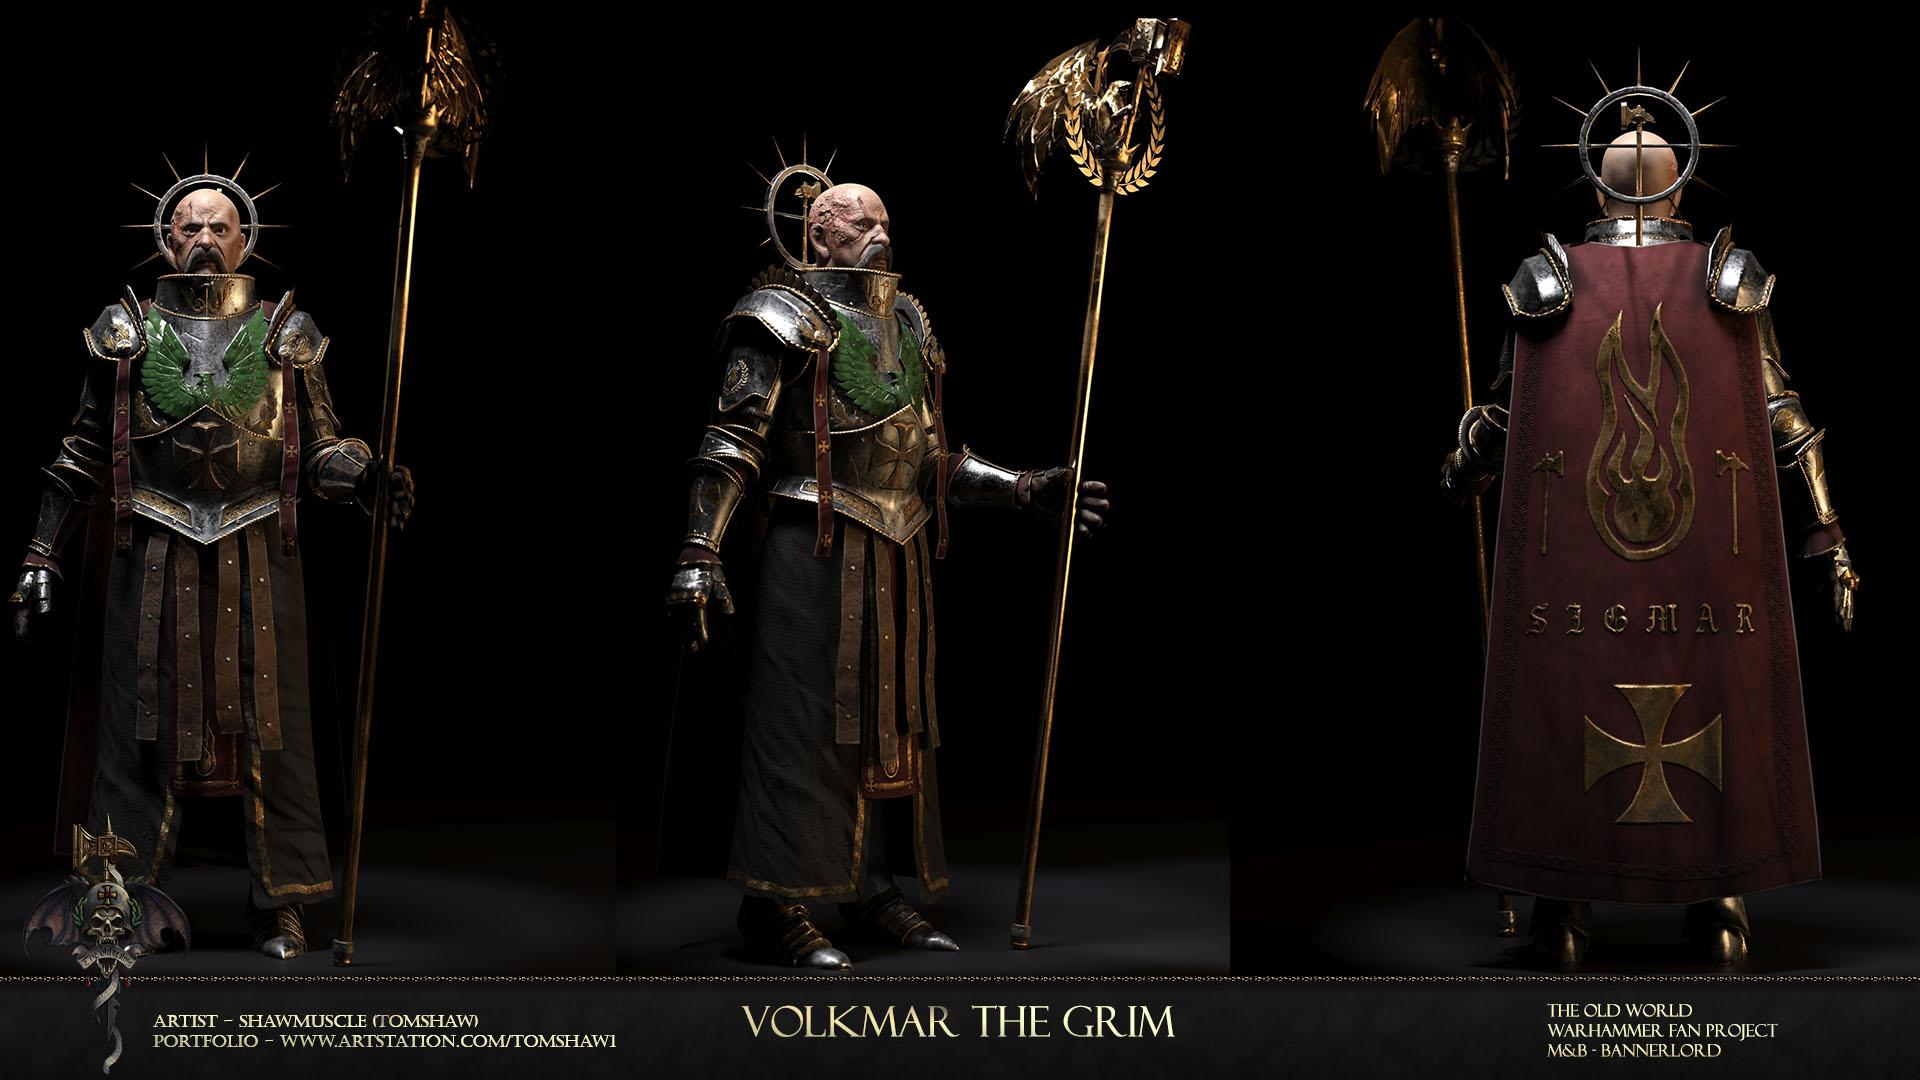 volkmar the grim